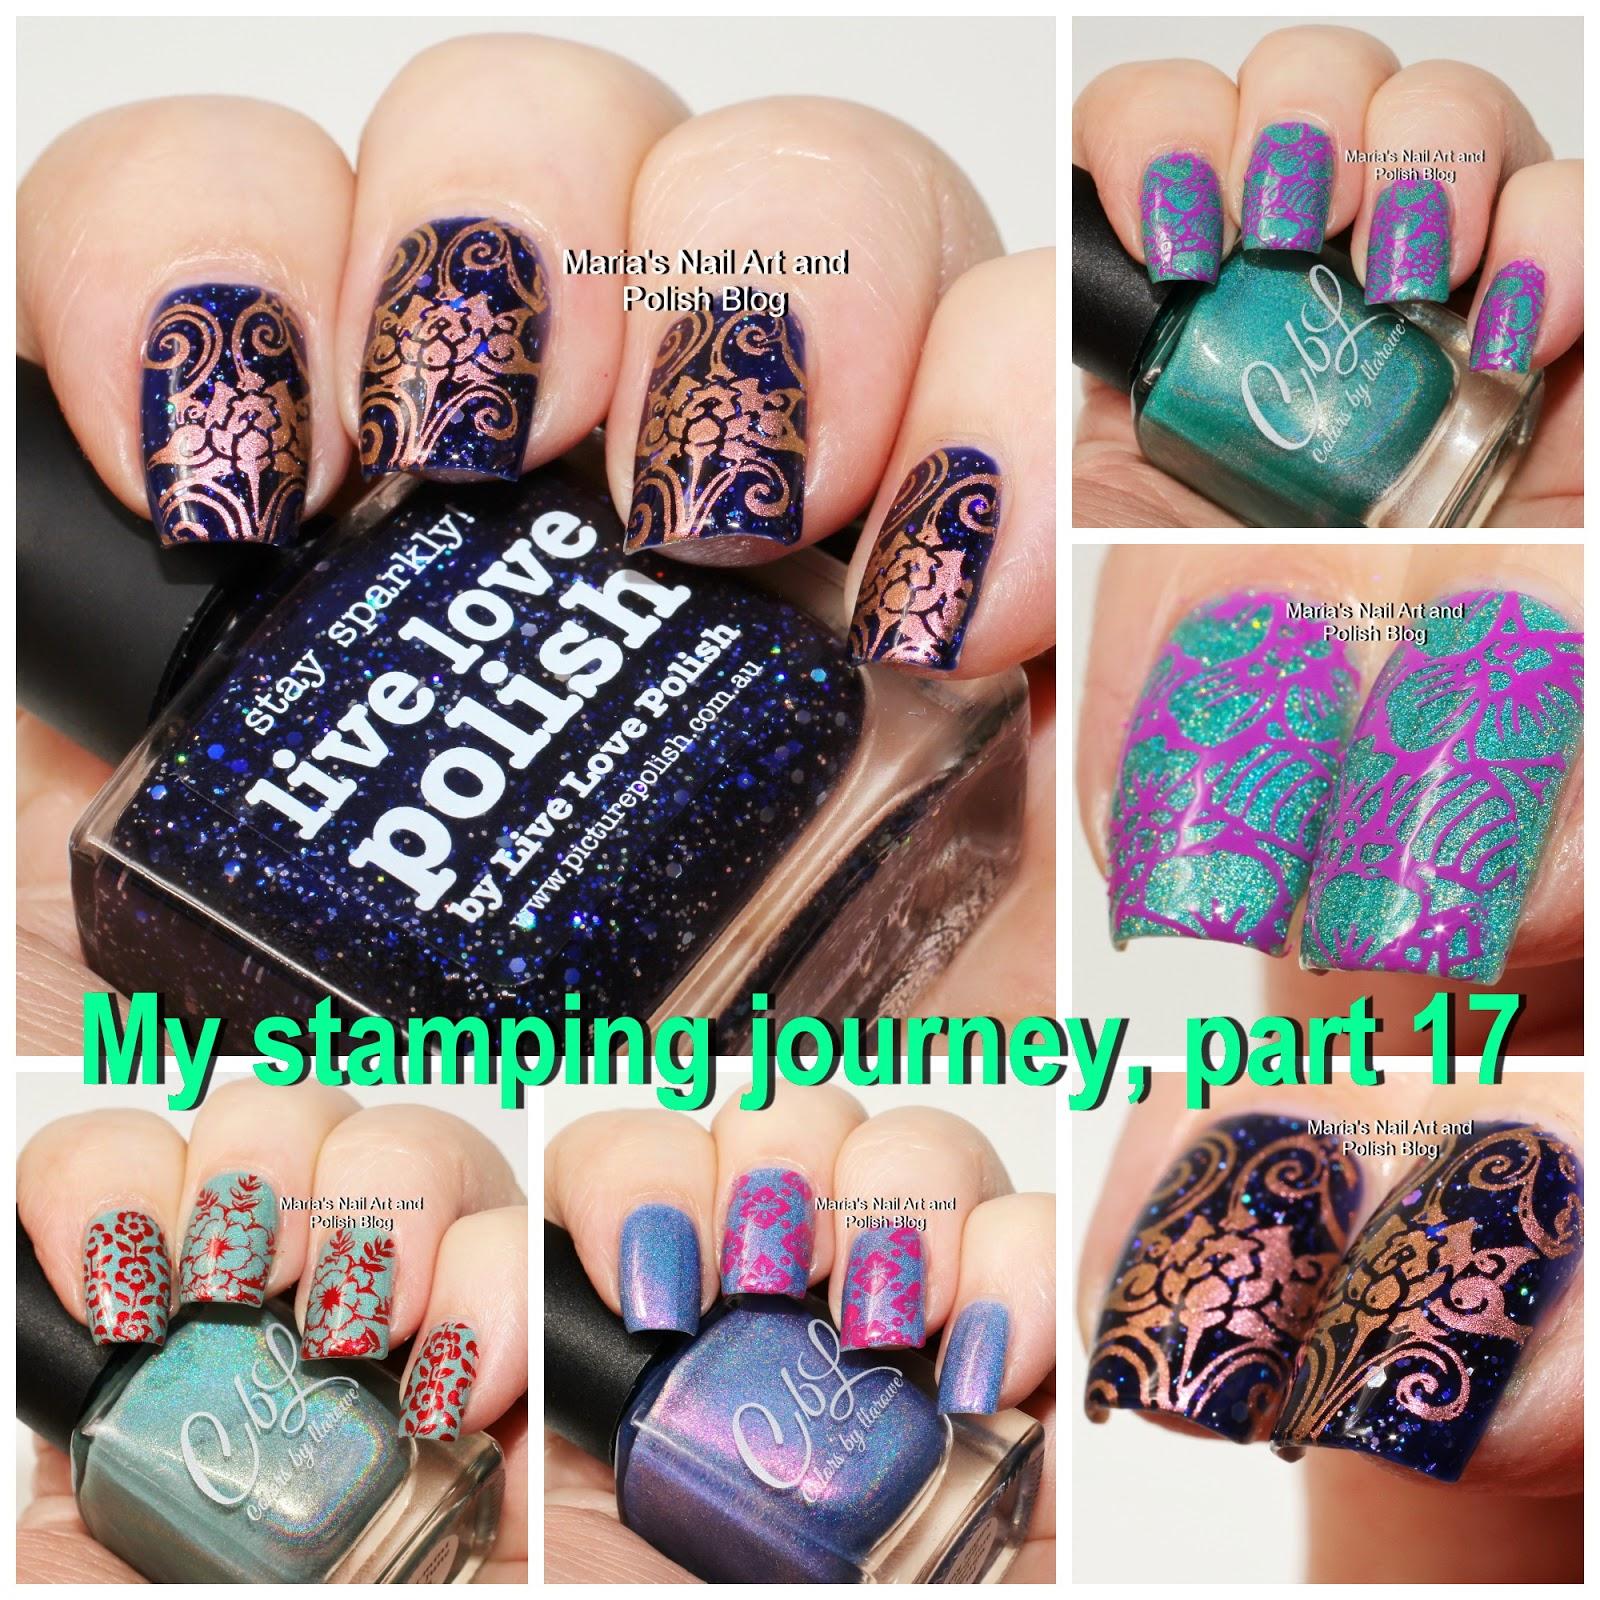 Marias nail art and polish blog my stamping journey part 17 its time again more stamping nail art from my stamping journey take 74 75 76 and 77 prinsesfo Gallery